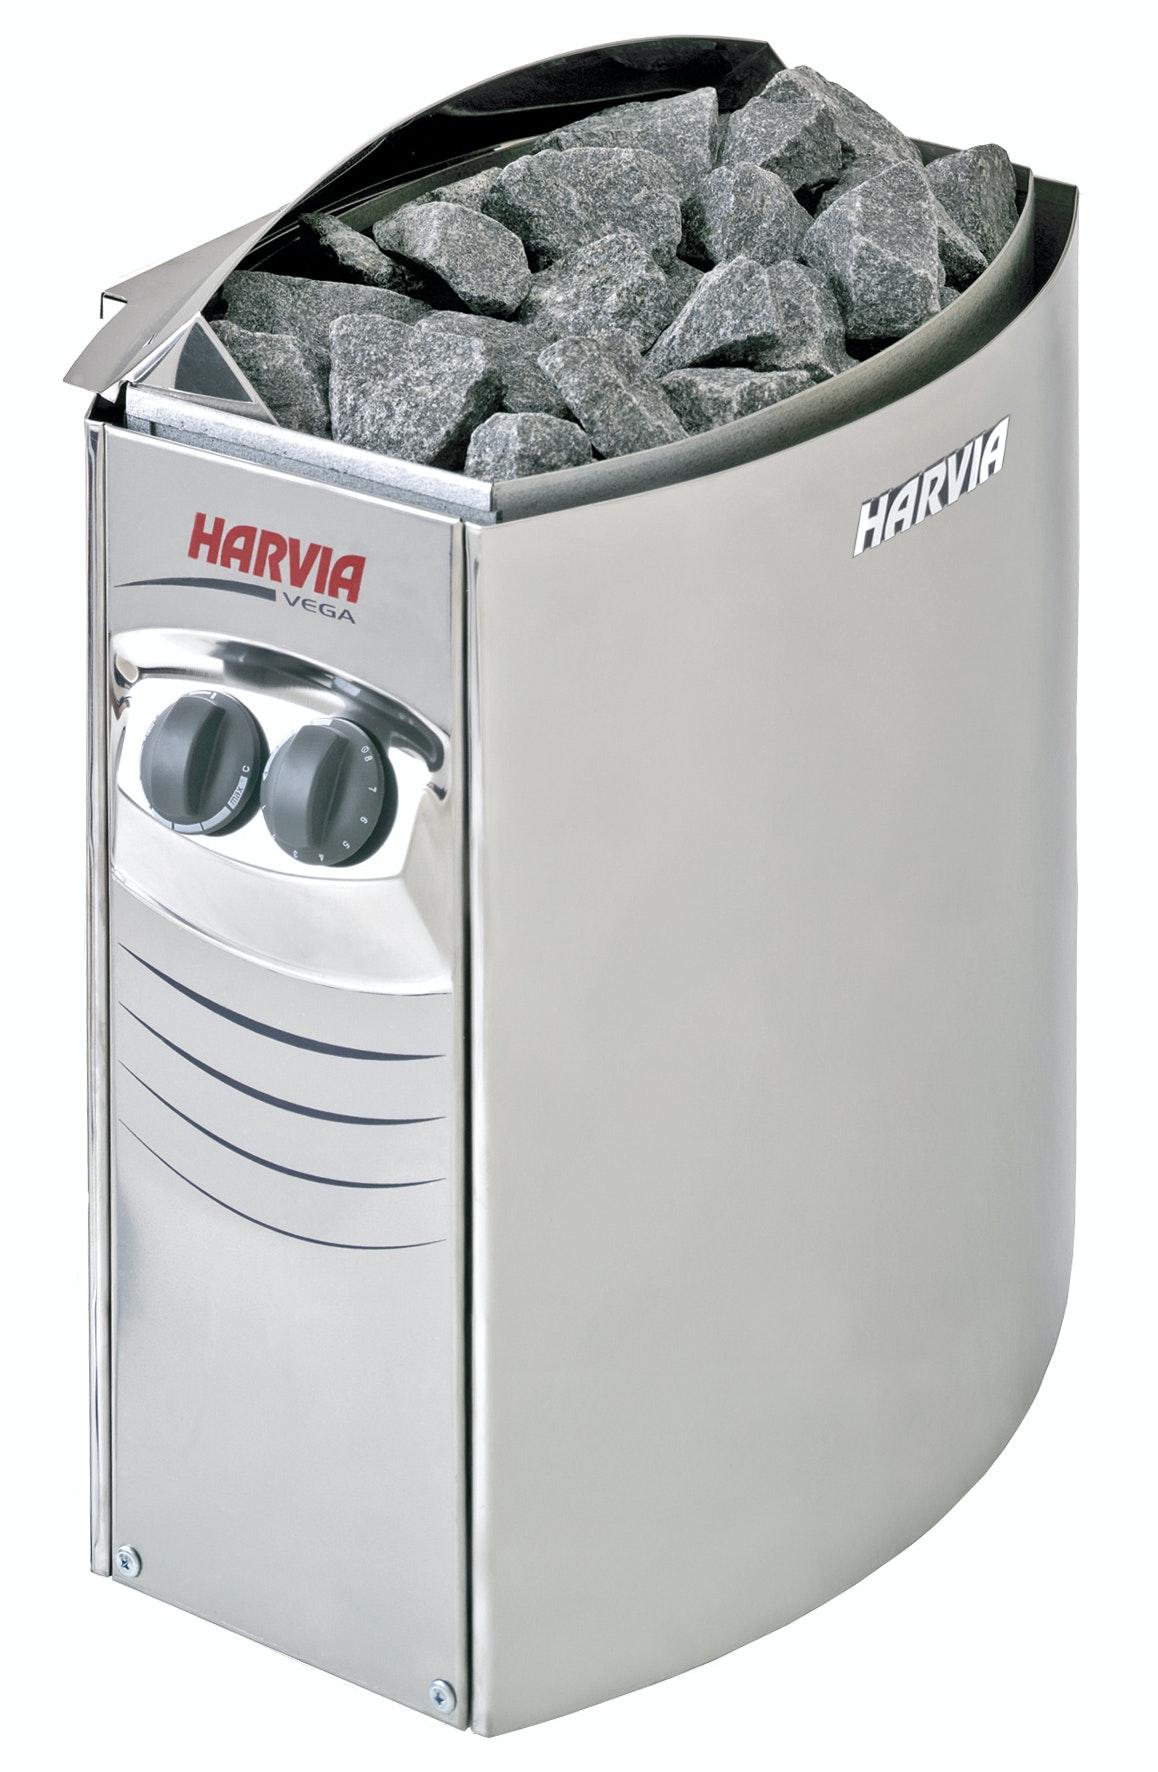 Bastuaggregat Harvia Vega BC80 8,0kW